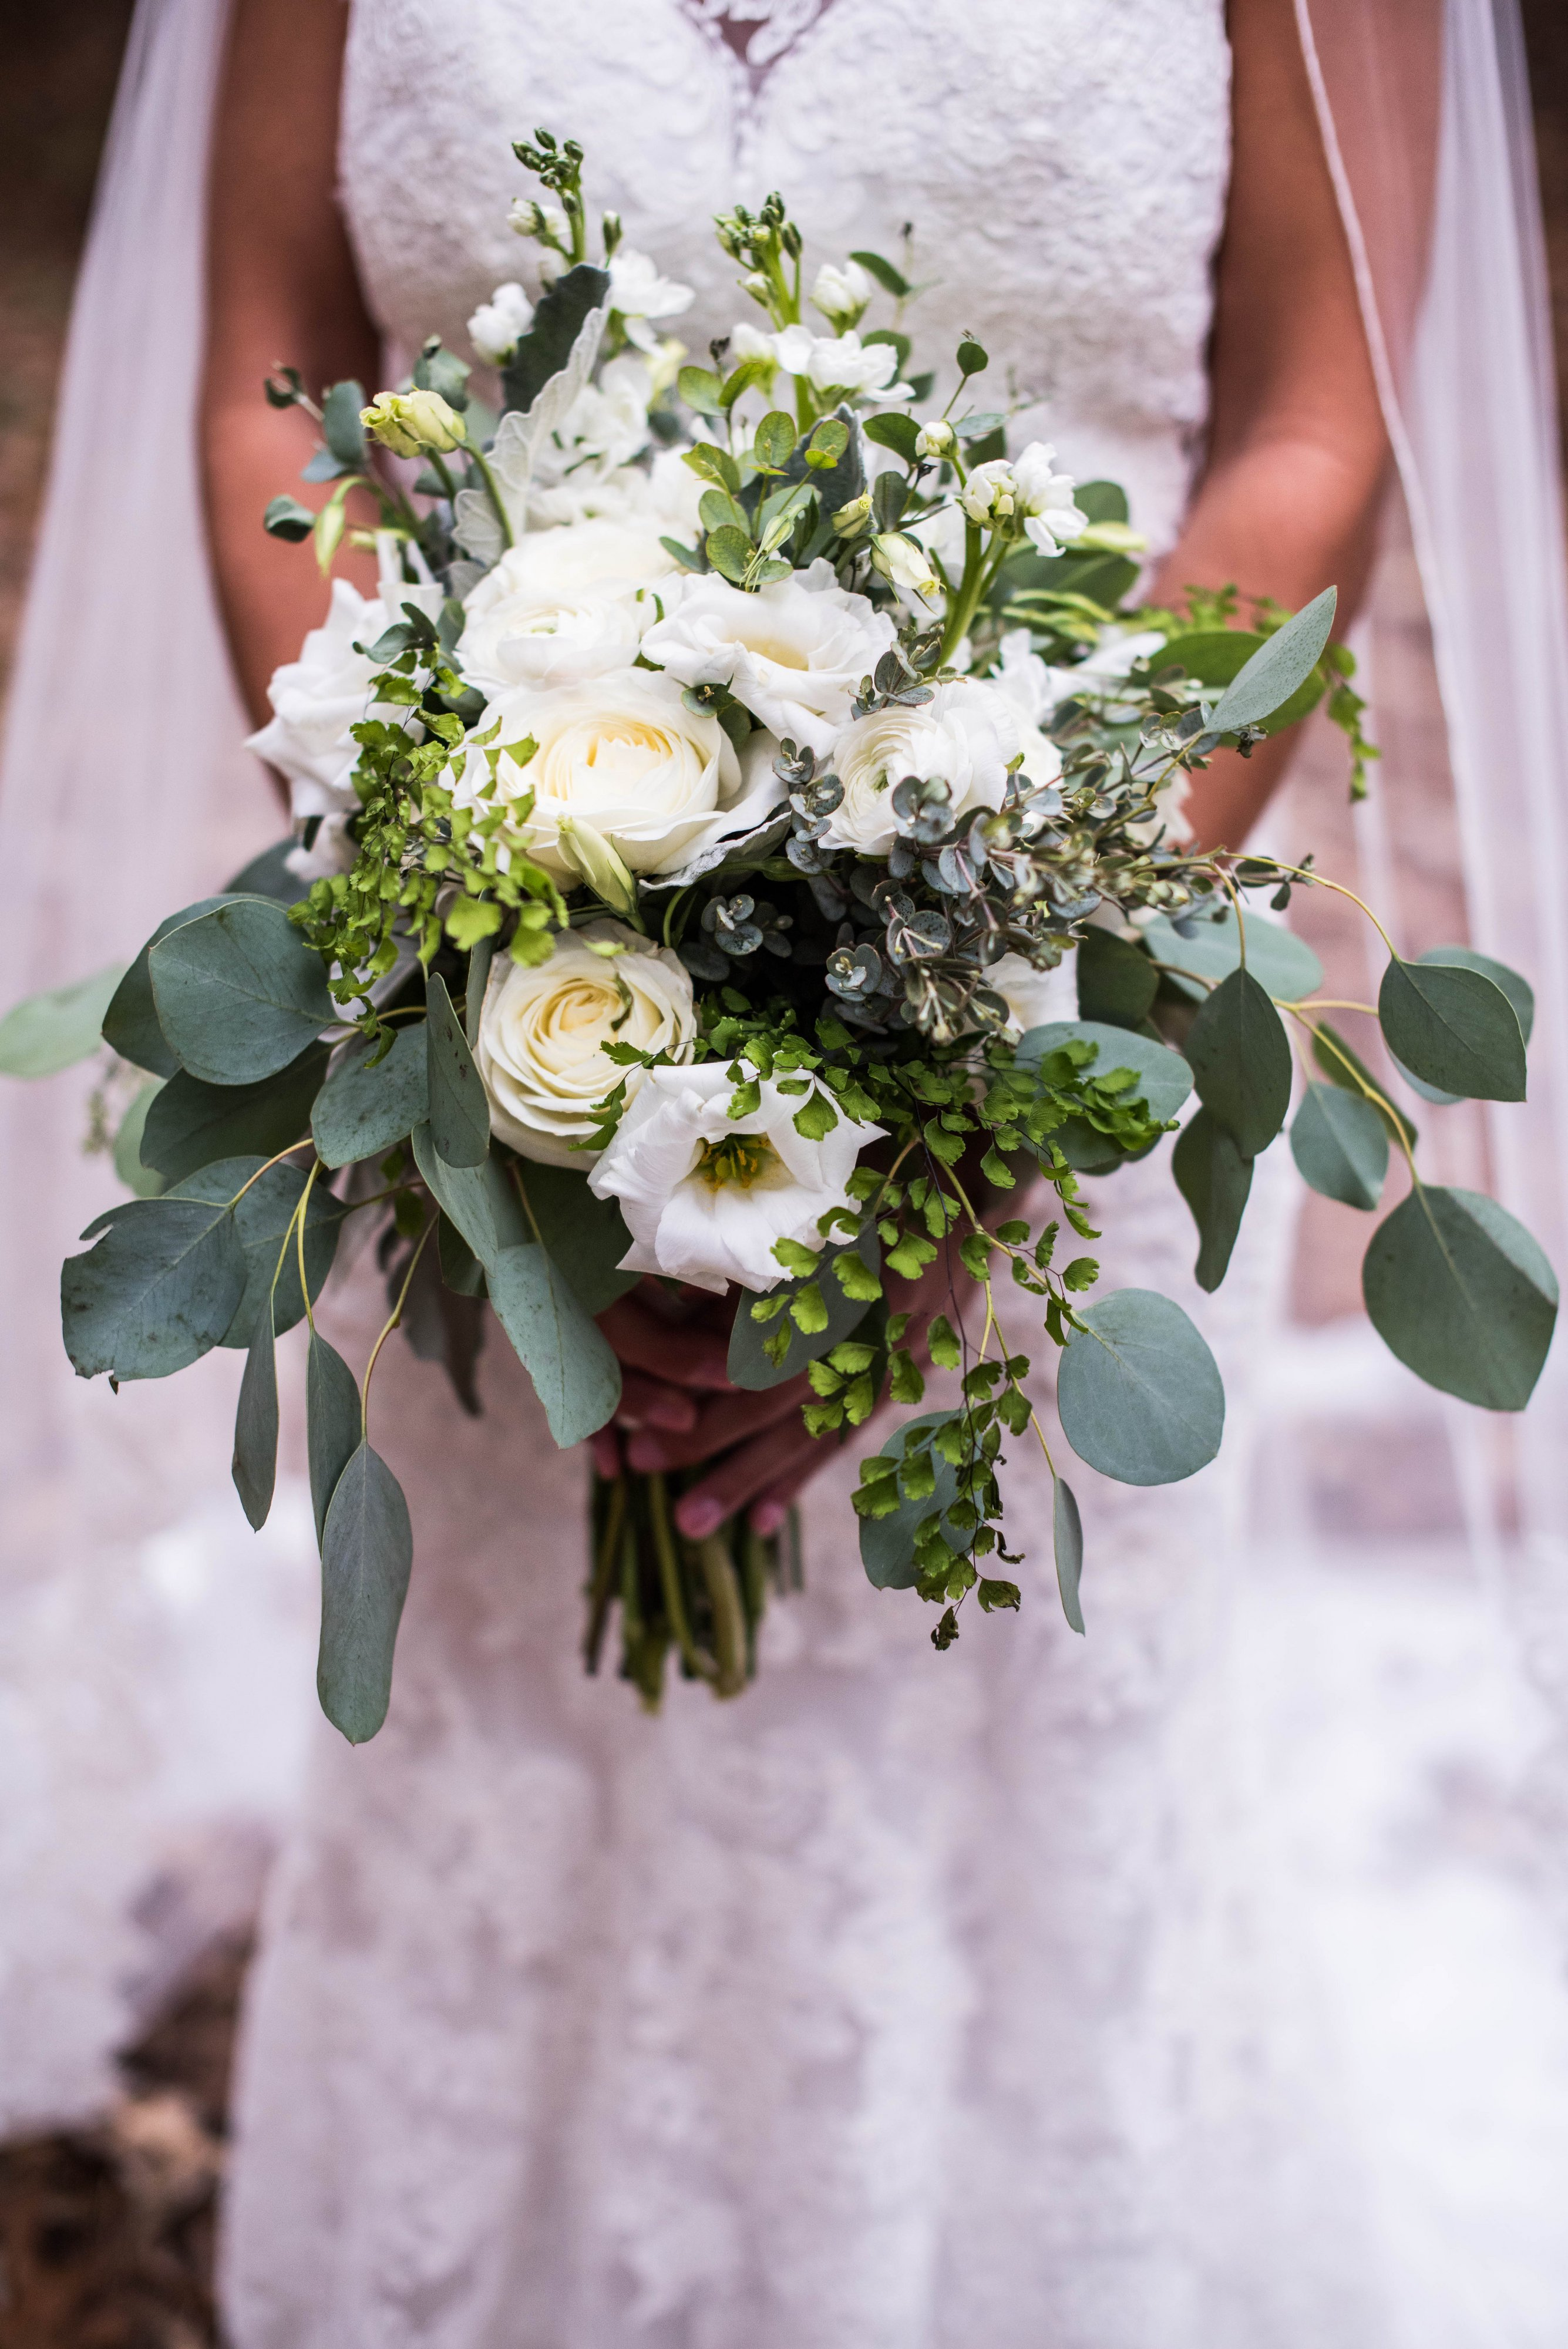 Virginia-Beach-Winter-Budget-Wedding-Lesner-Inn-Greenery-Bouquet-Stellar-Exposures-Photography.jpg